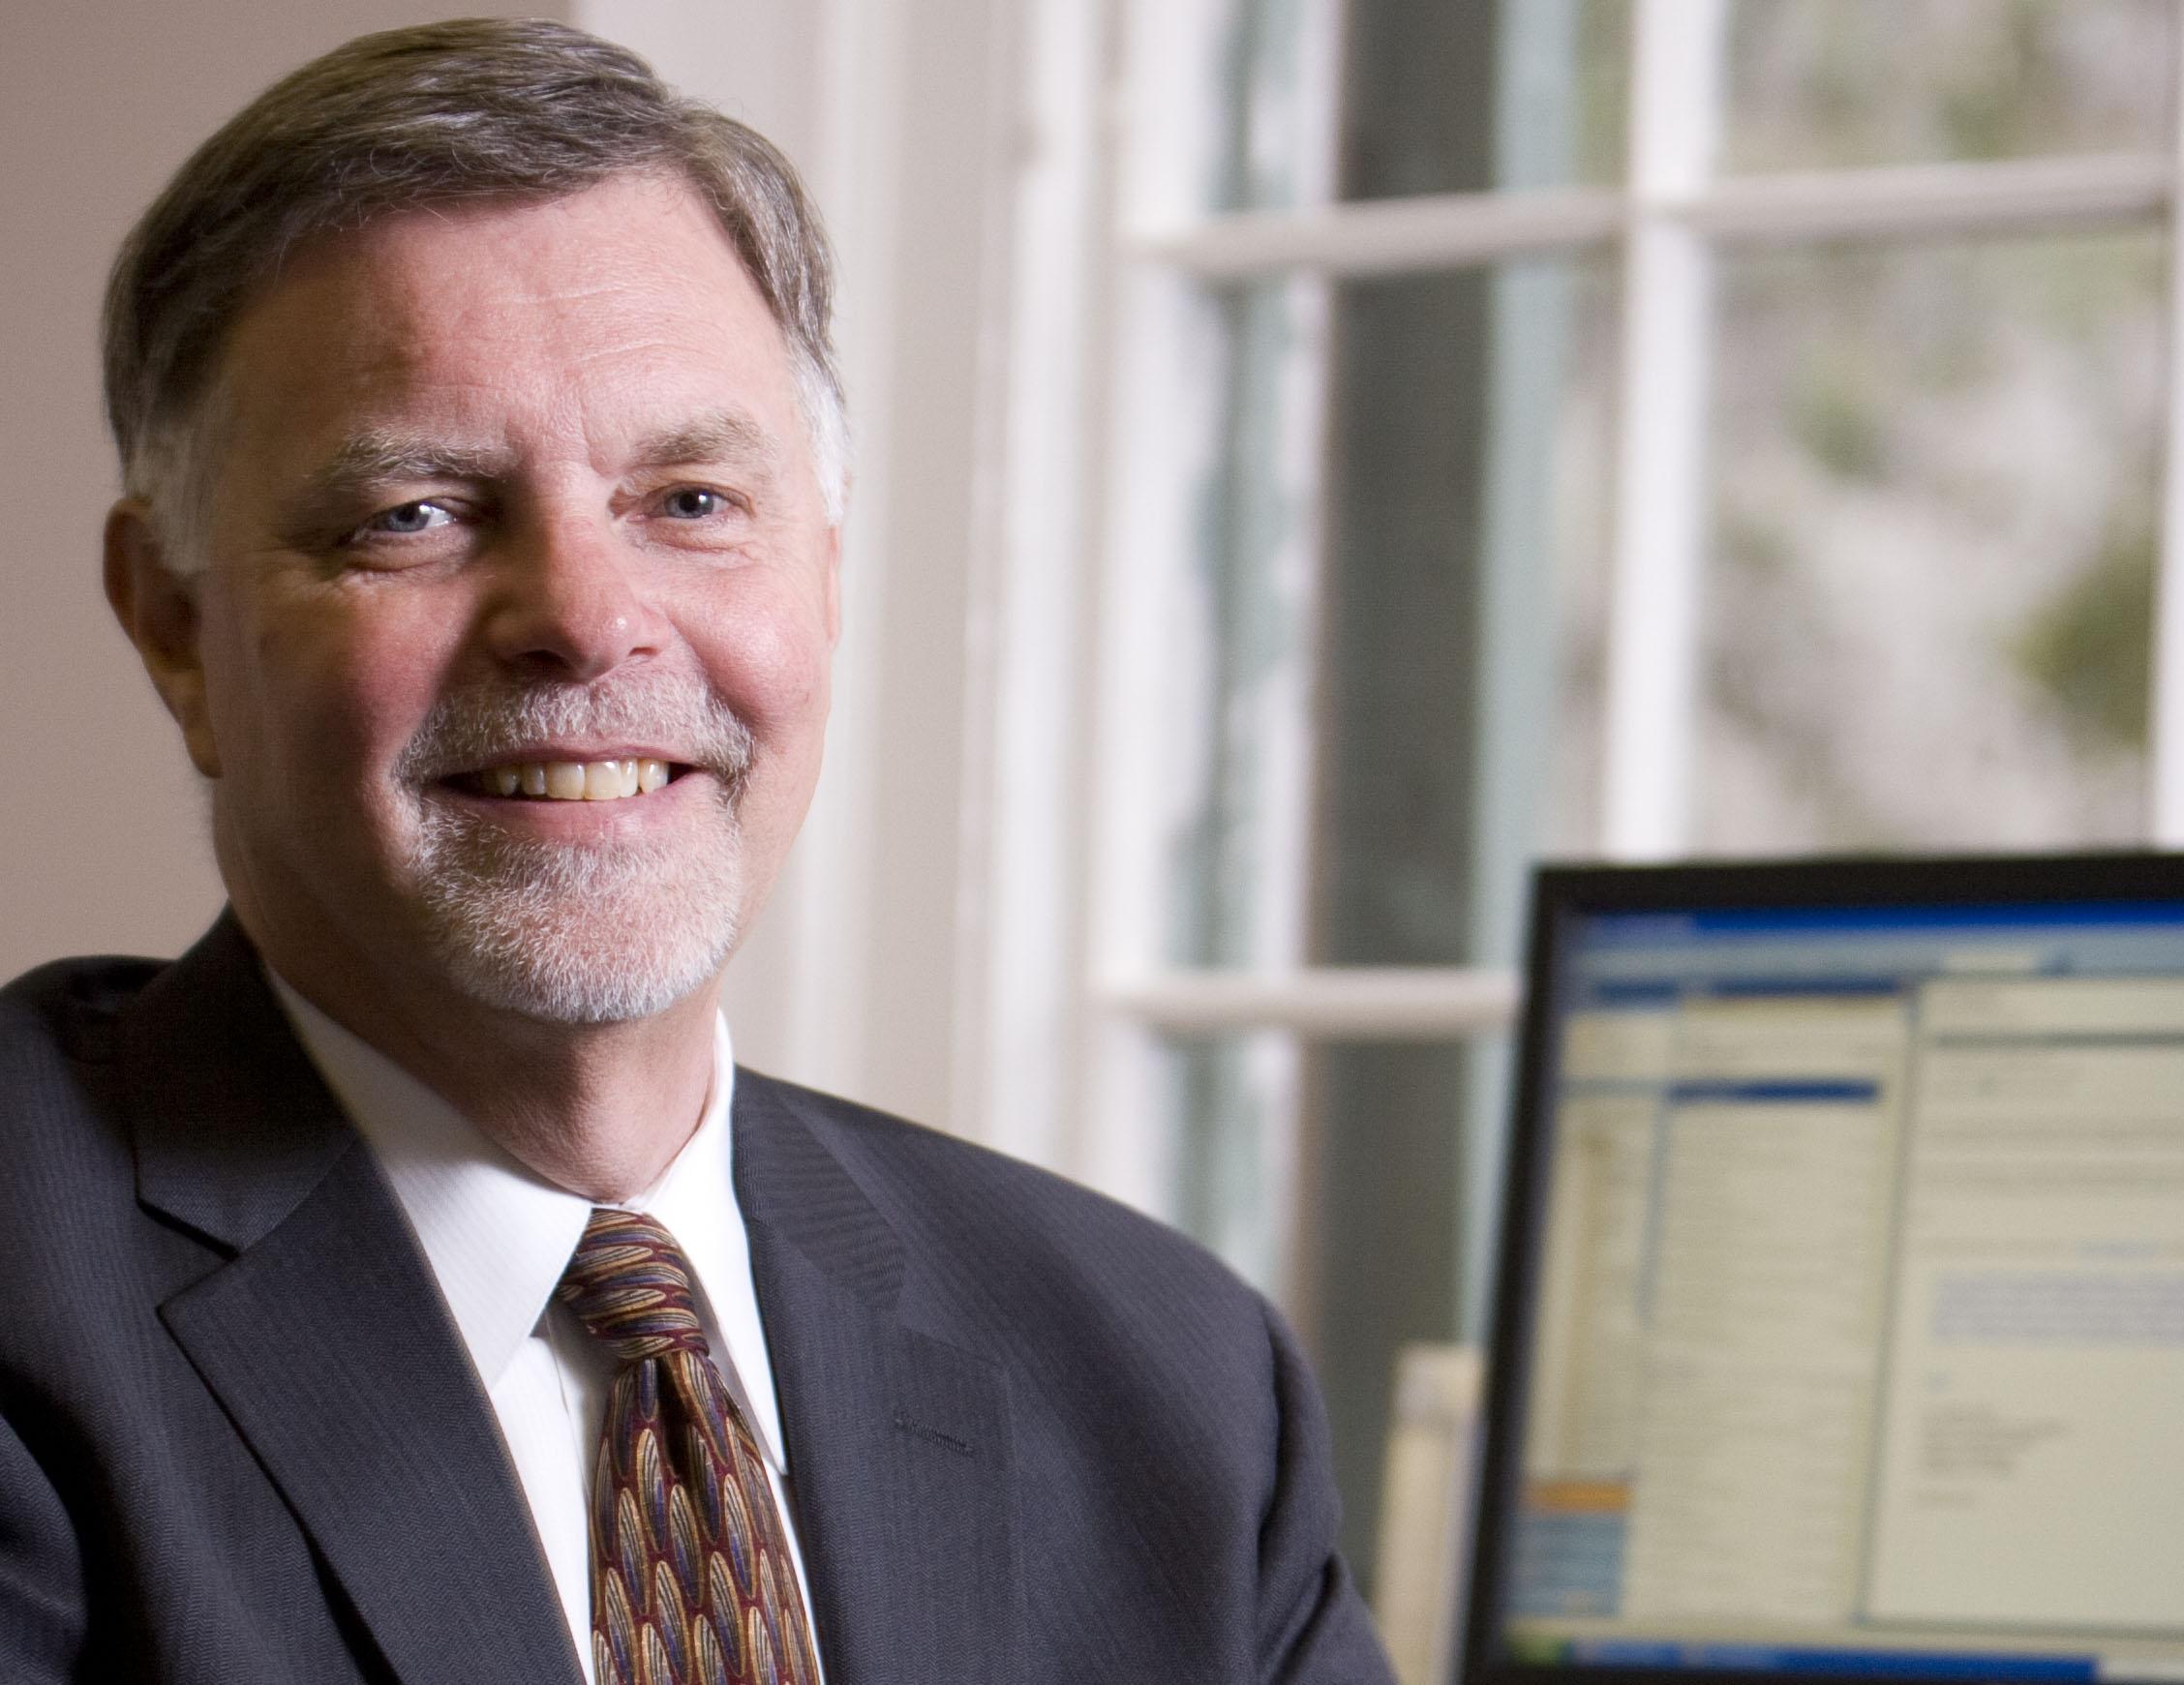 College of Charleston Provost George Hynd